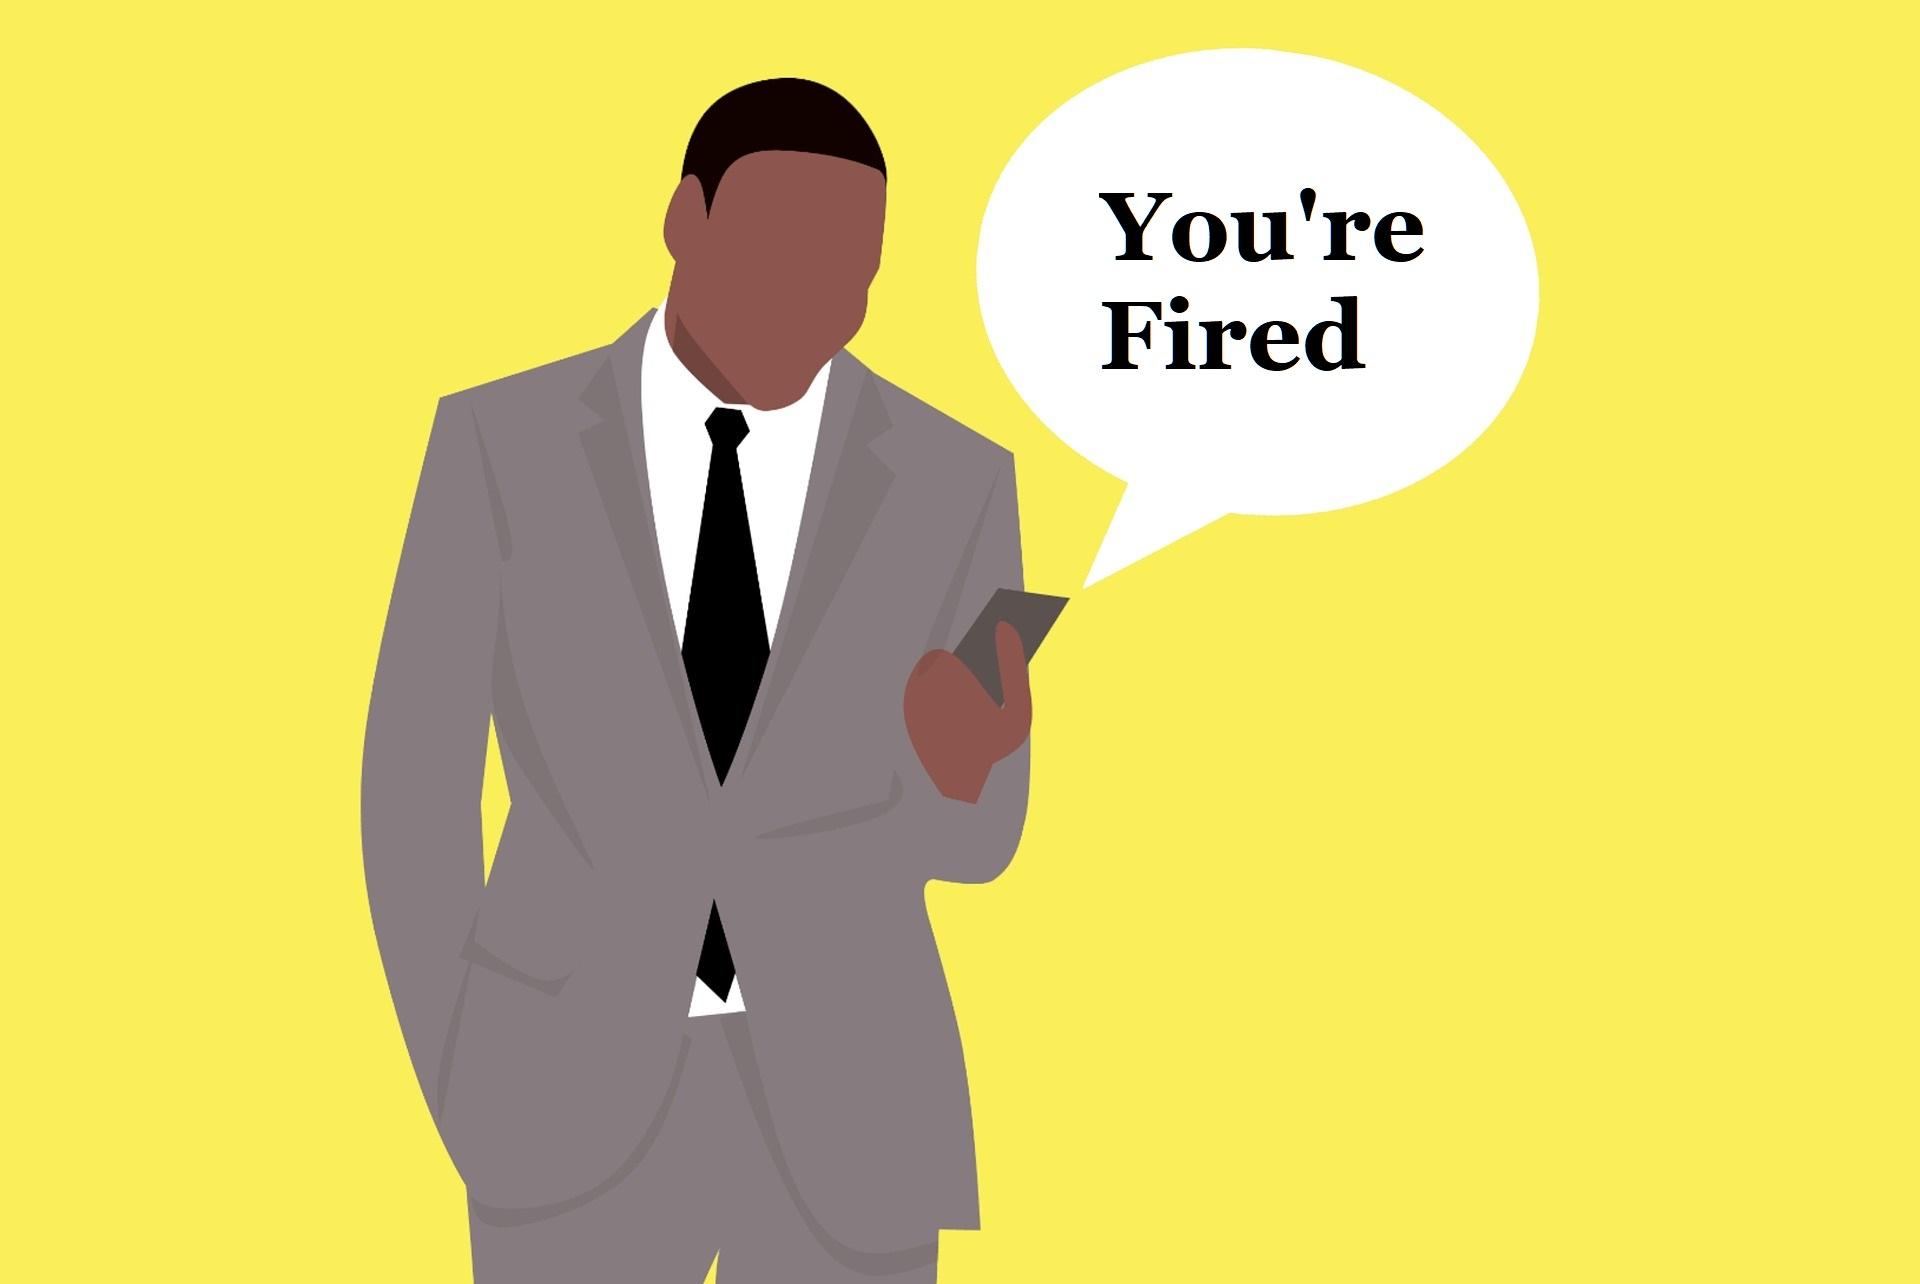 I got fired